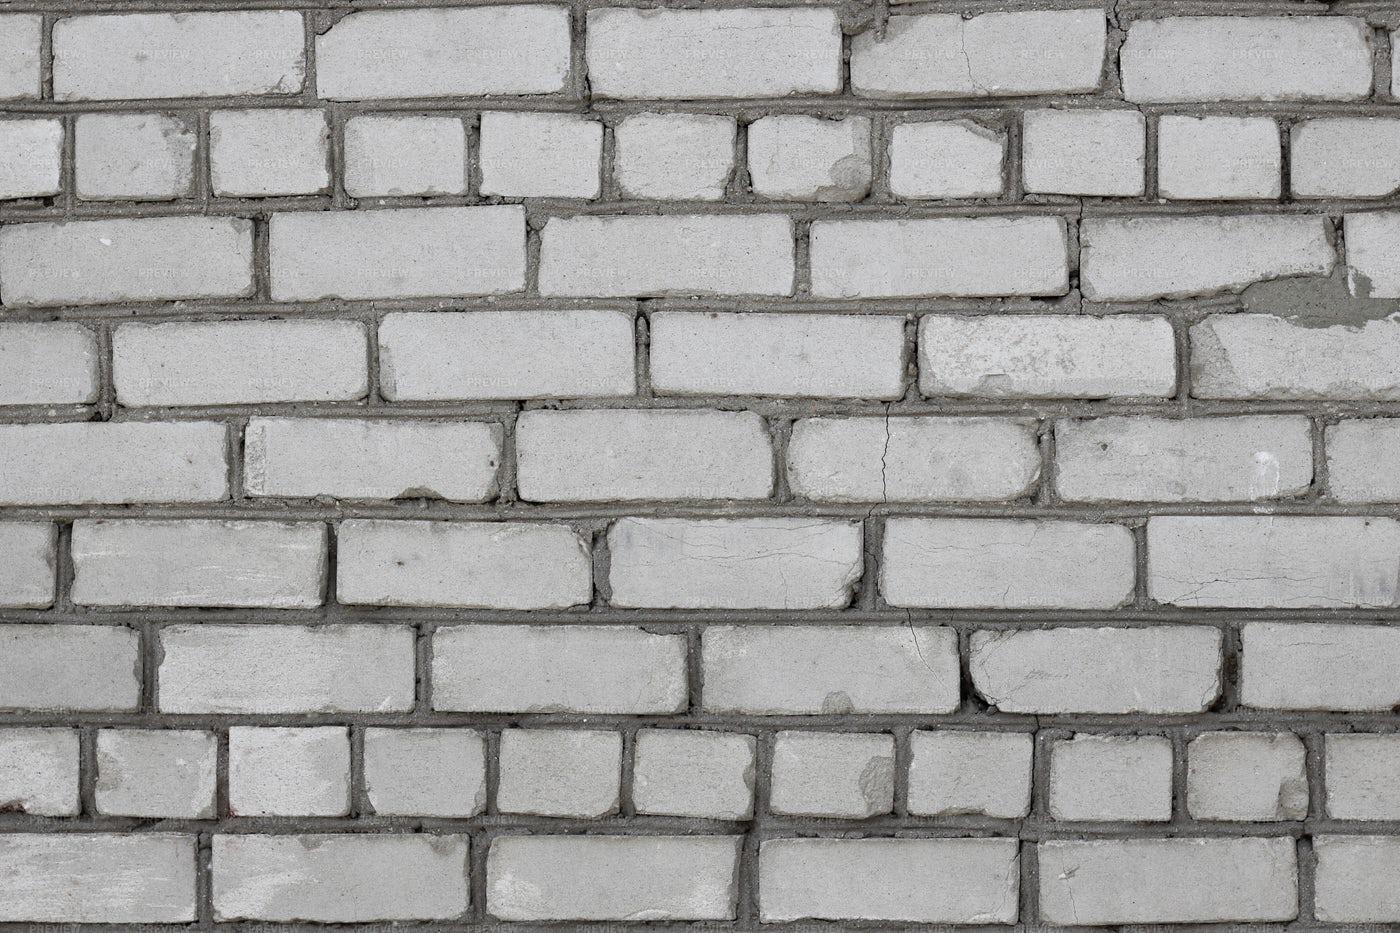 Grey Brick Wall: Stock Photos